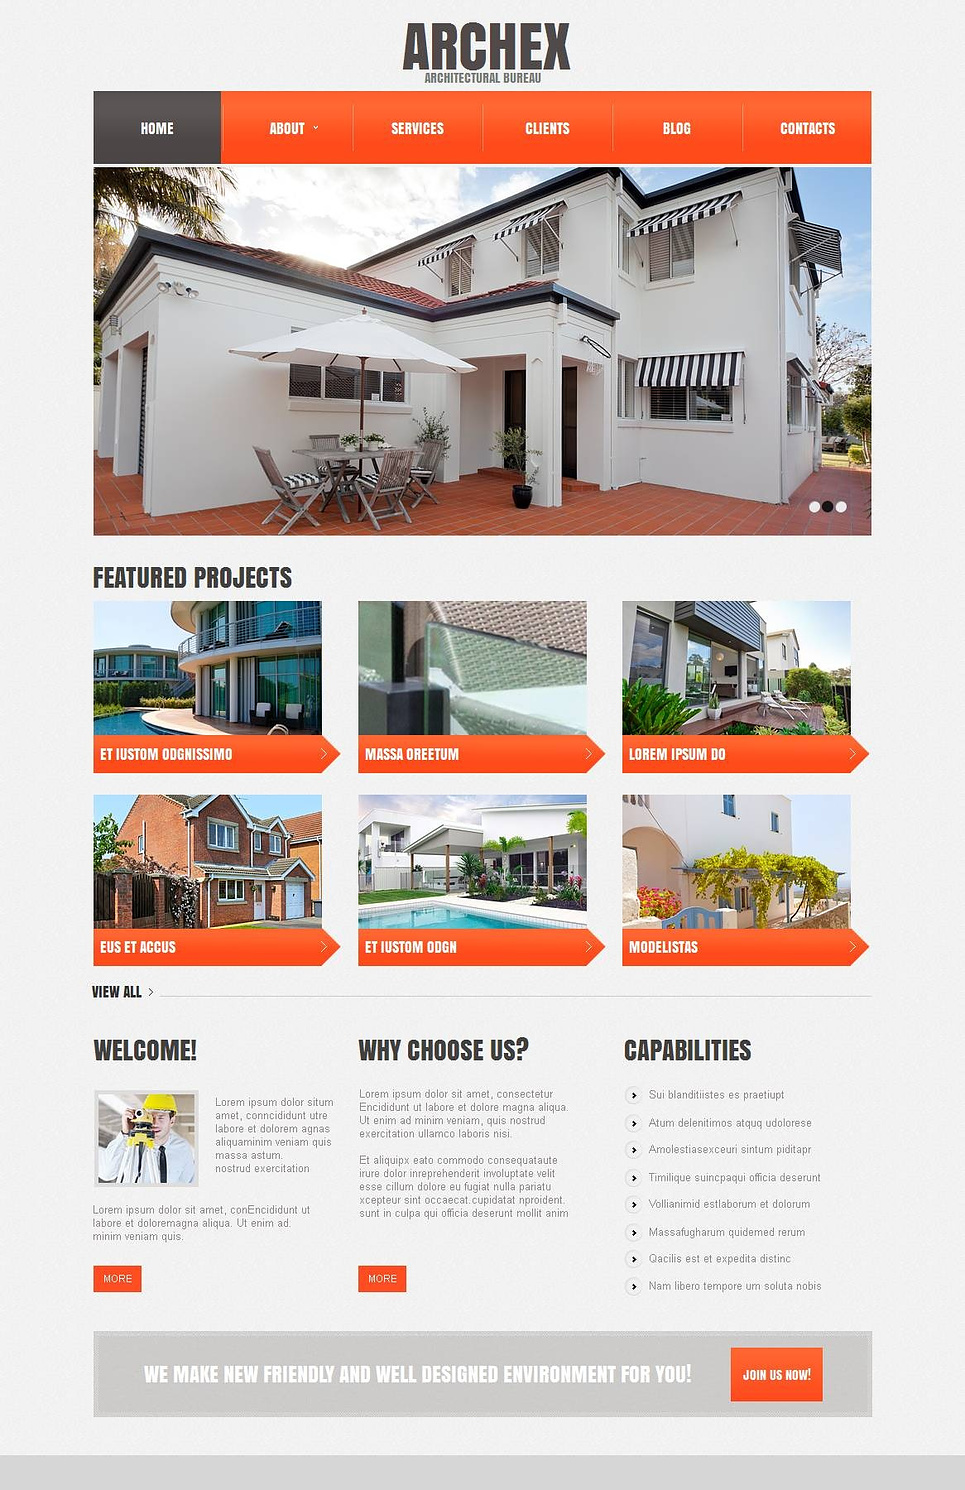 Gray Architecture Website Template with Orange Navigation Menu - image